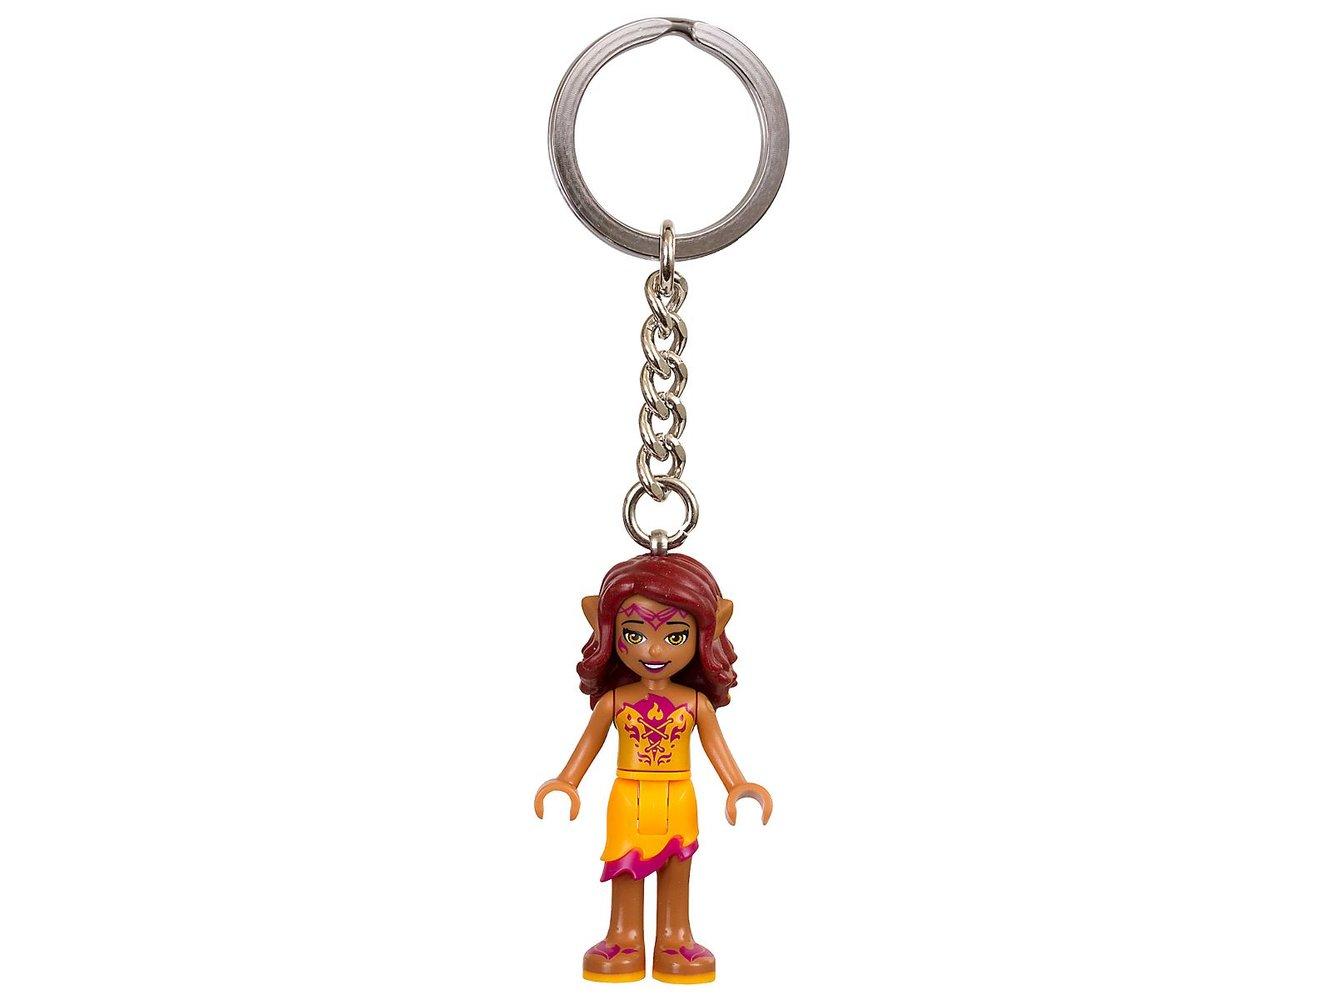 Azari the Fire Elf Key Chain